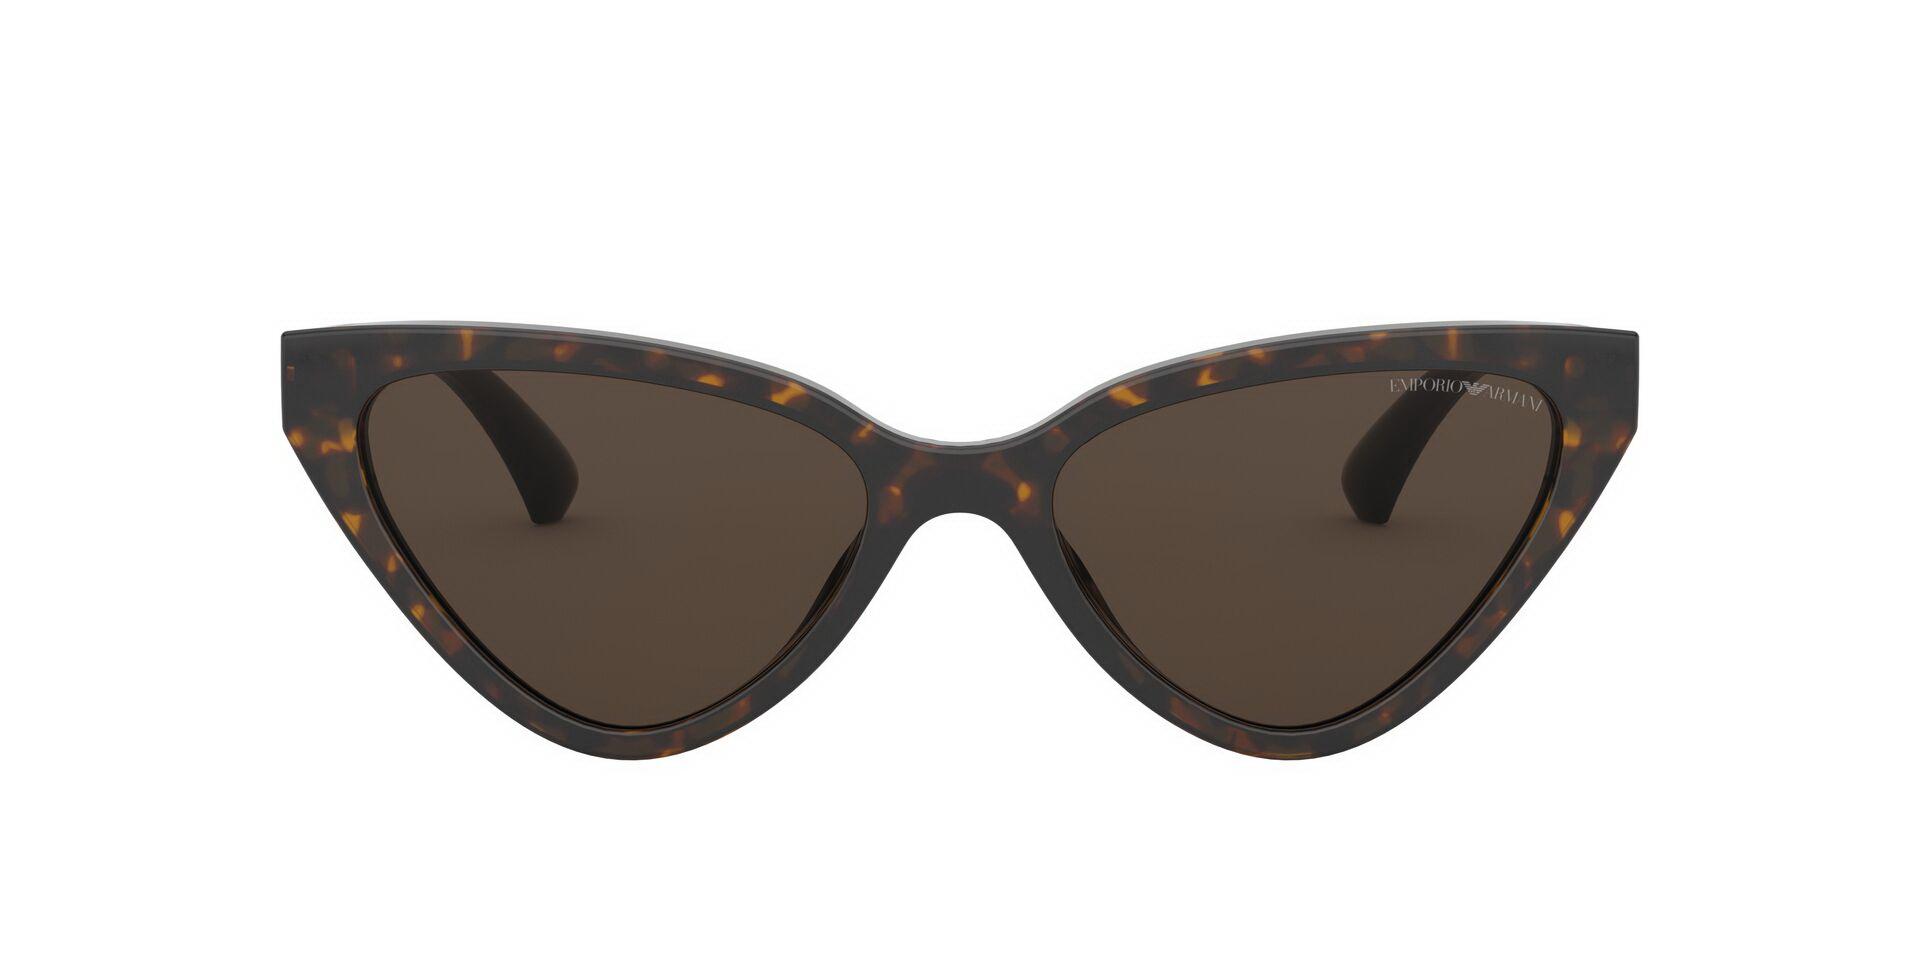 Солнцезащитные очки Очки с/з Emporio Armani 0EA4136 508973 фото